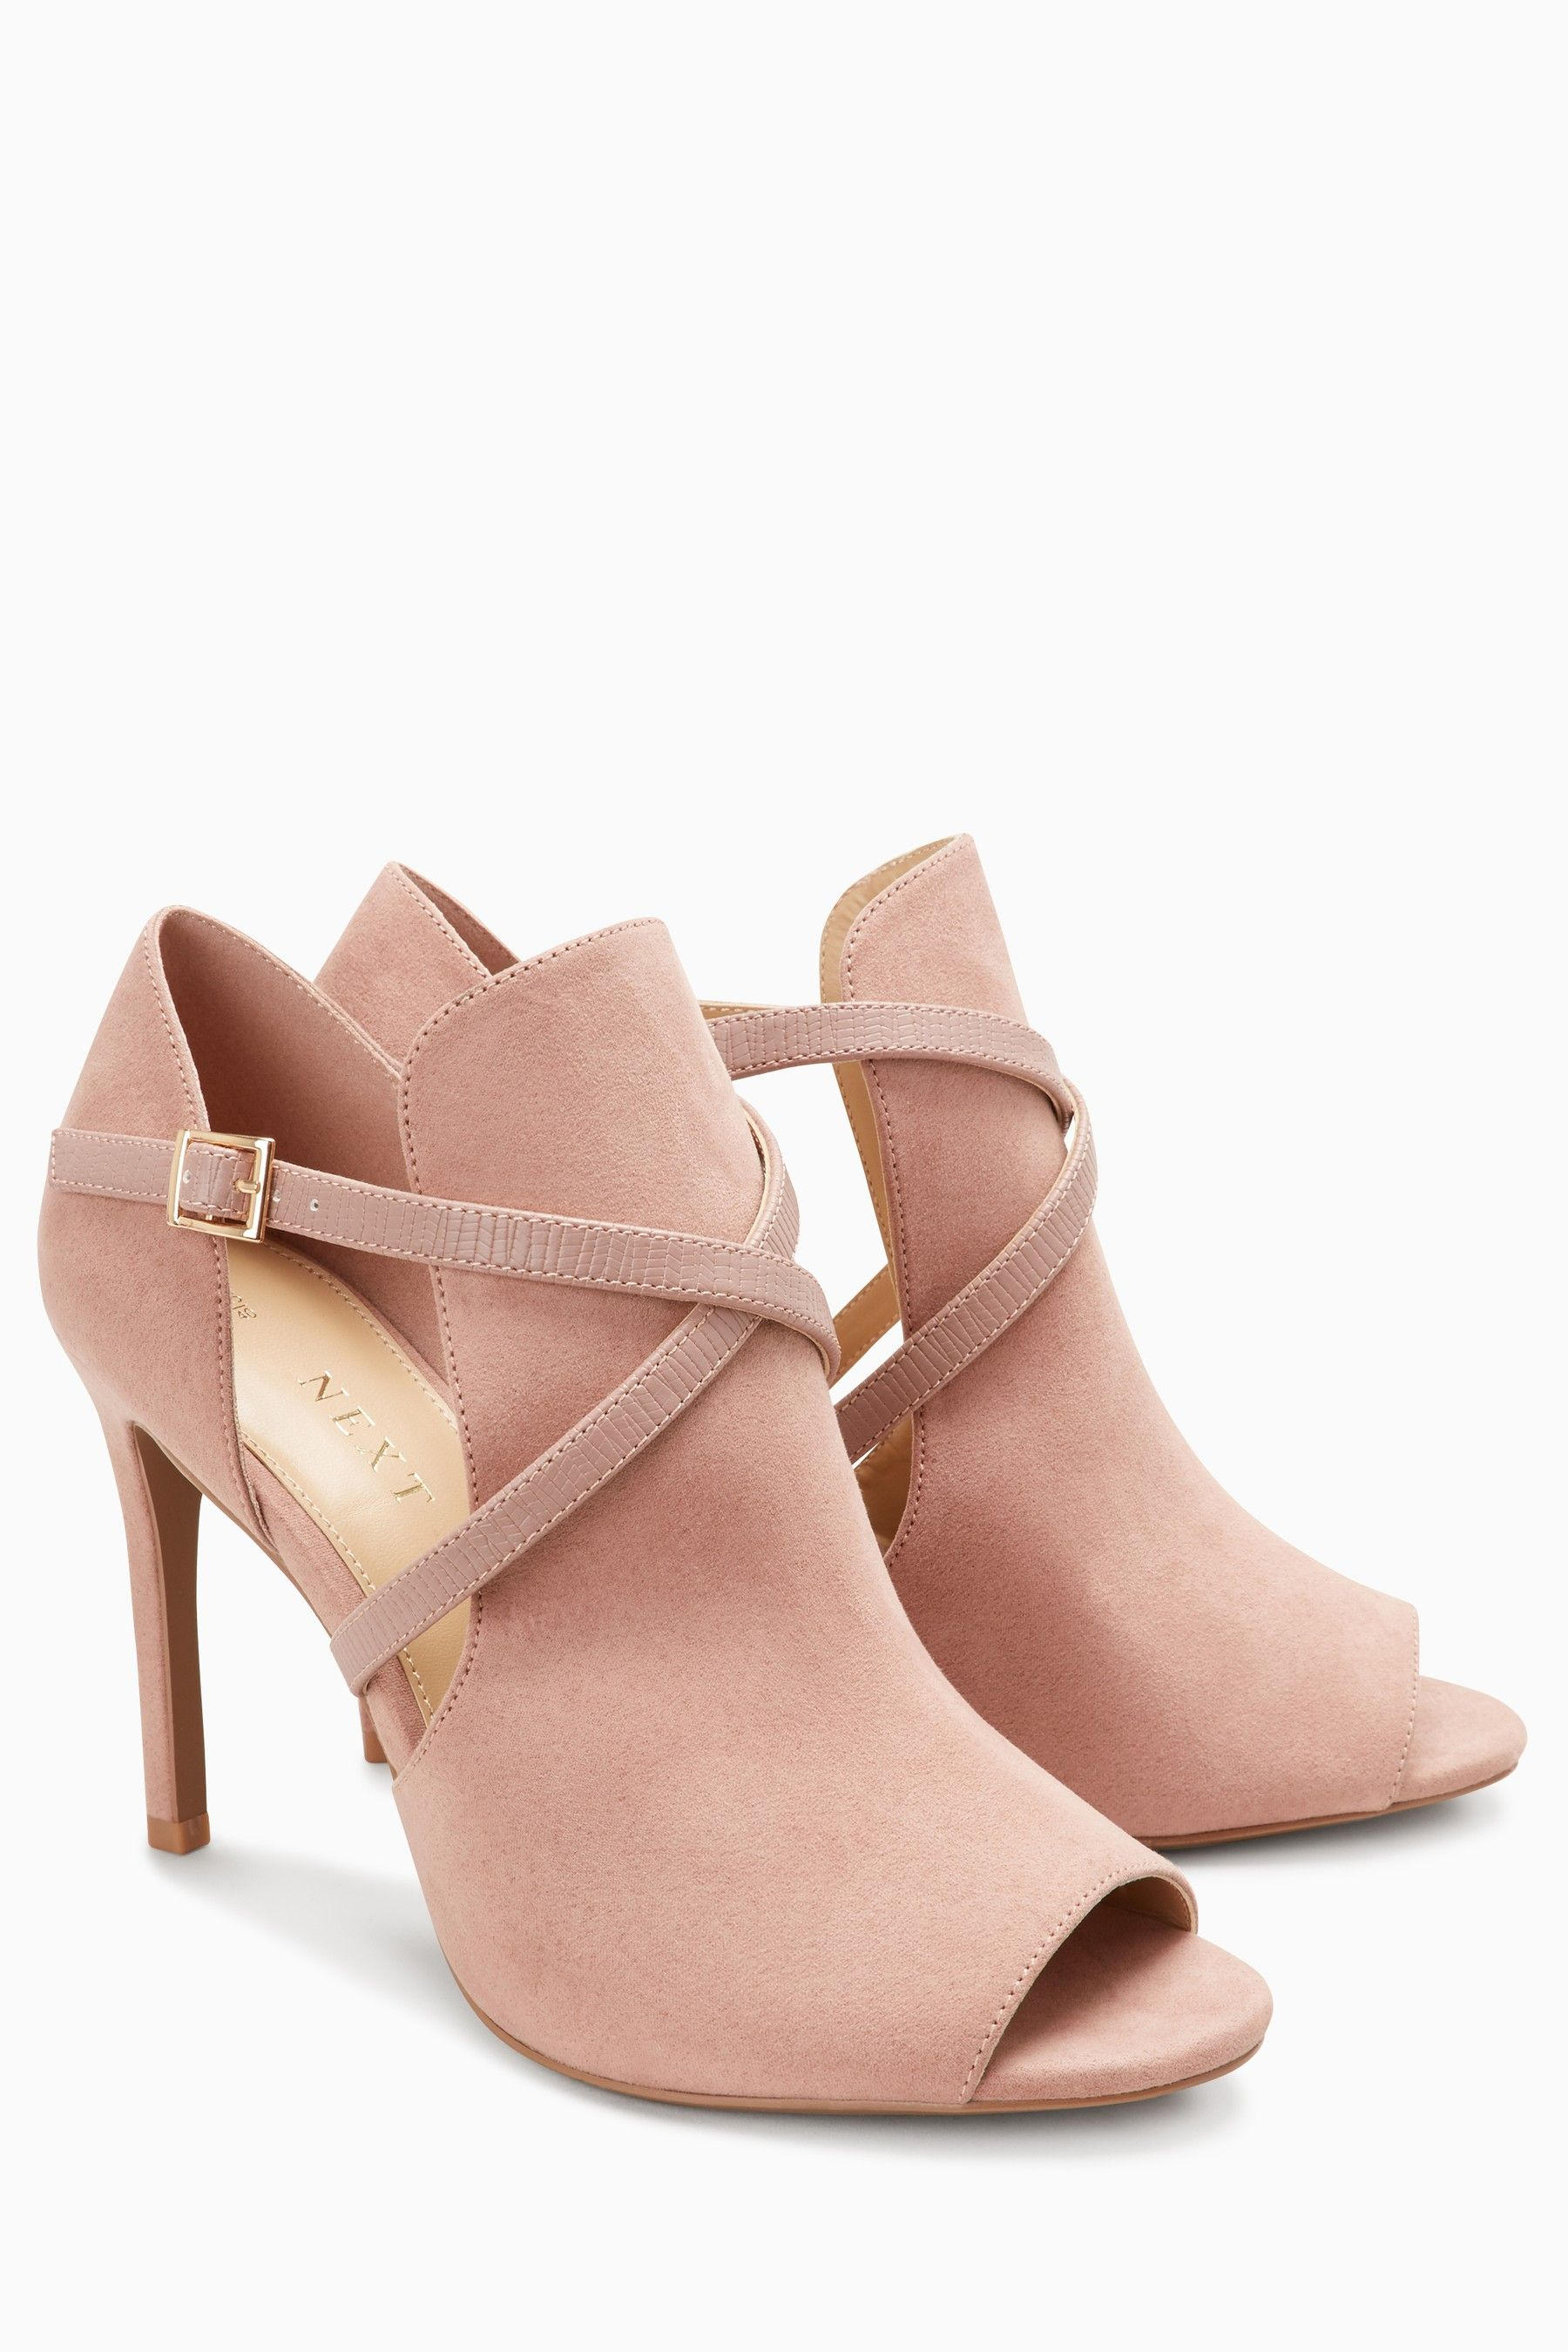 ca6143600fb Womens Next Blush Cross Strap Shoeboots - Pink Blush Heels